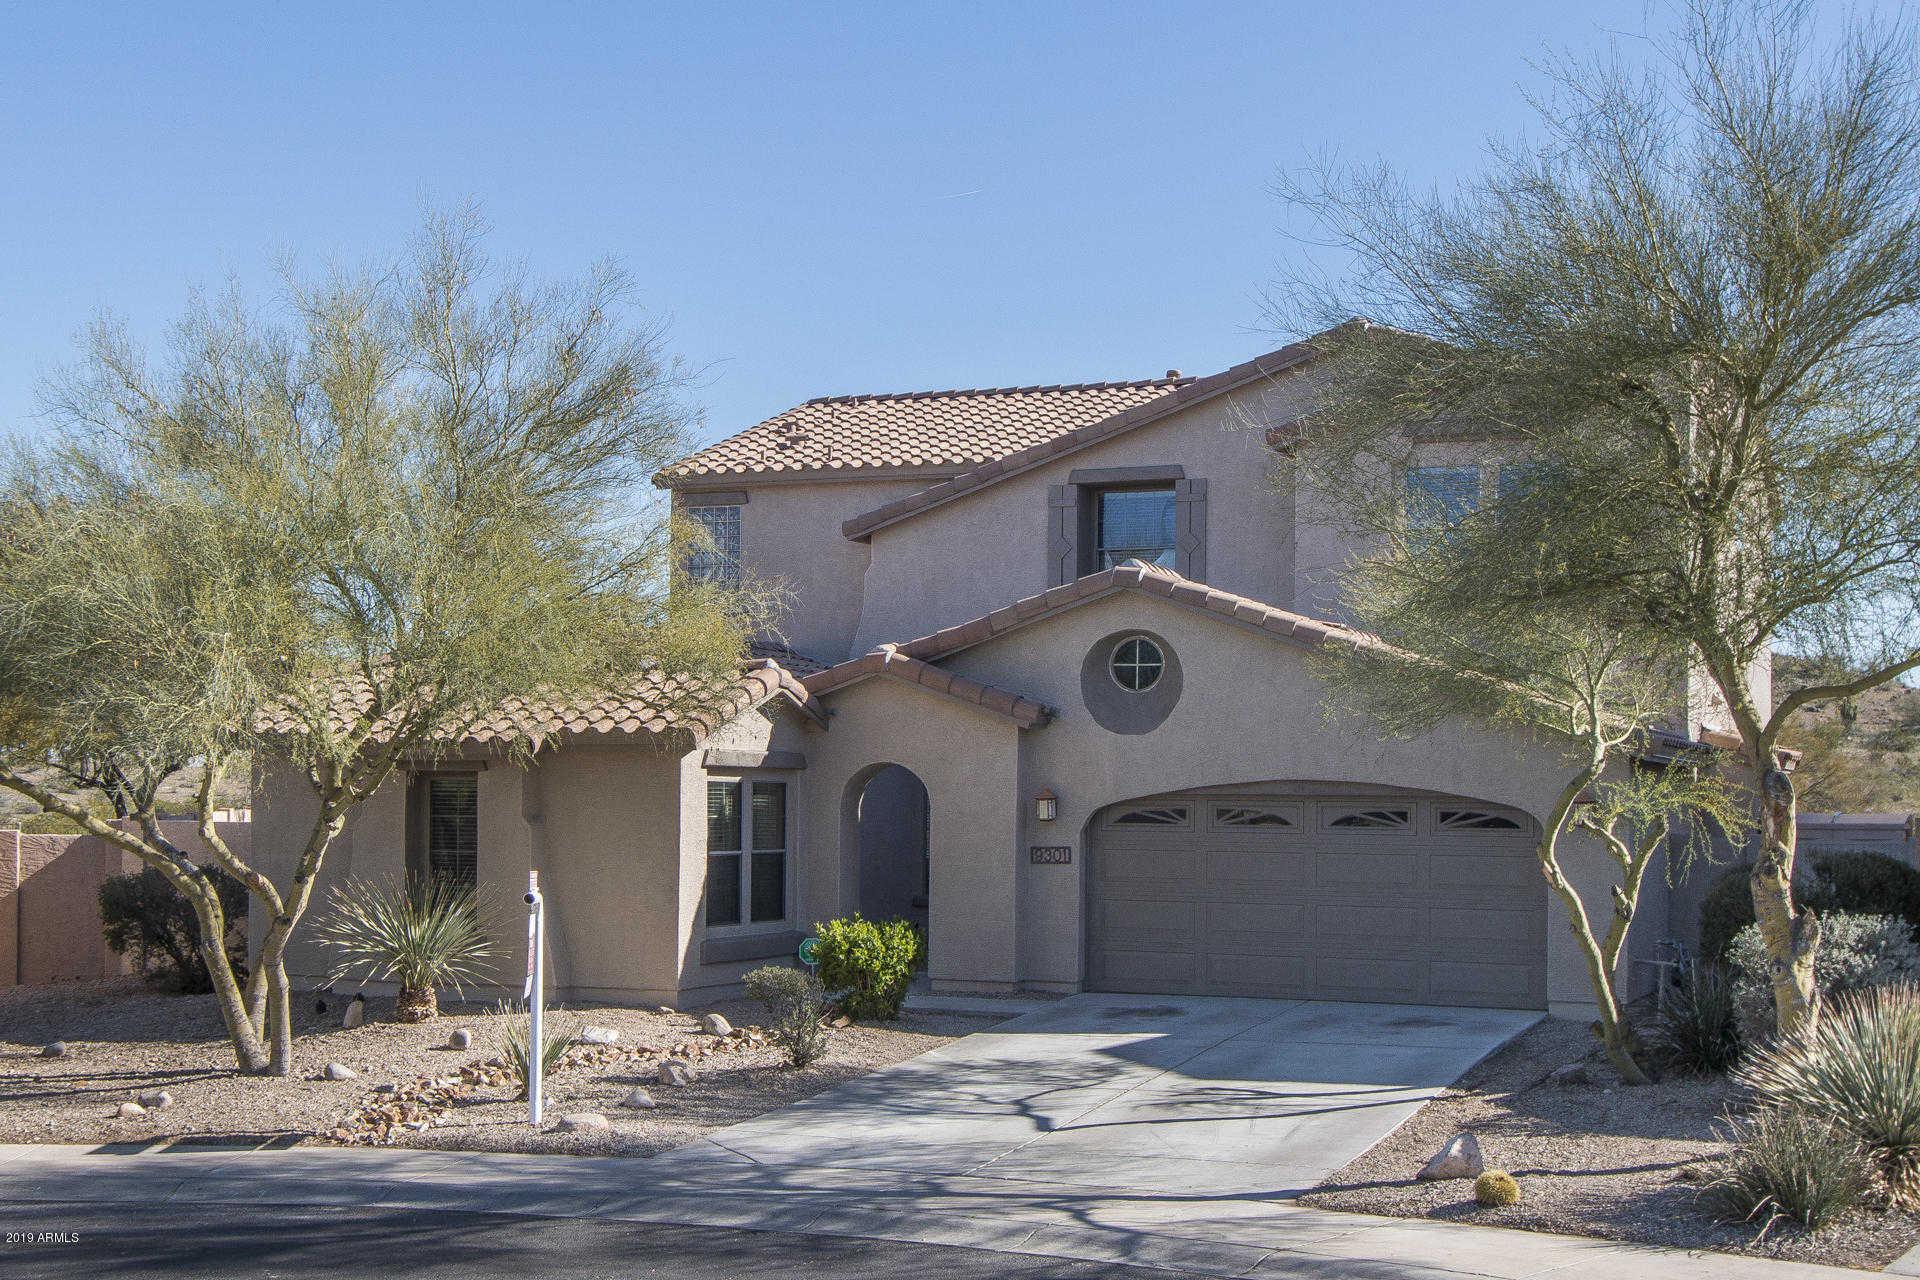 $394,850 - 5Br/3Ba - Home for Sale in Estrella Mountain Ranch Parcel 74, Goodyear